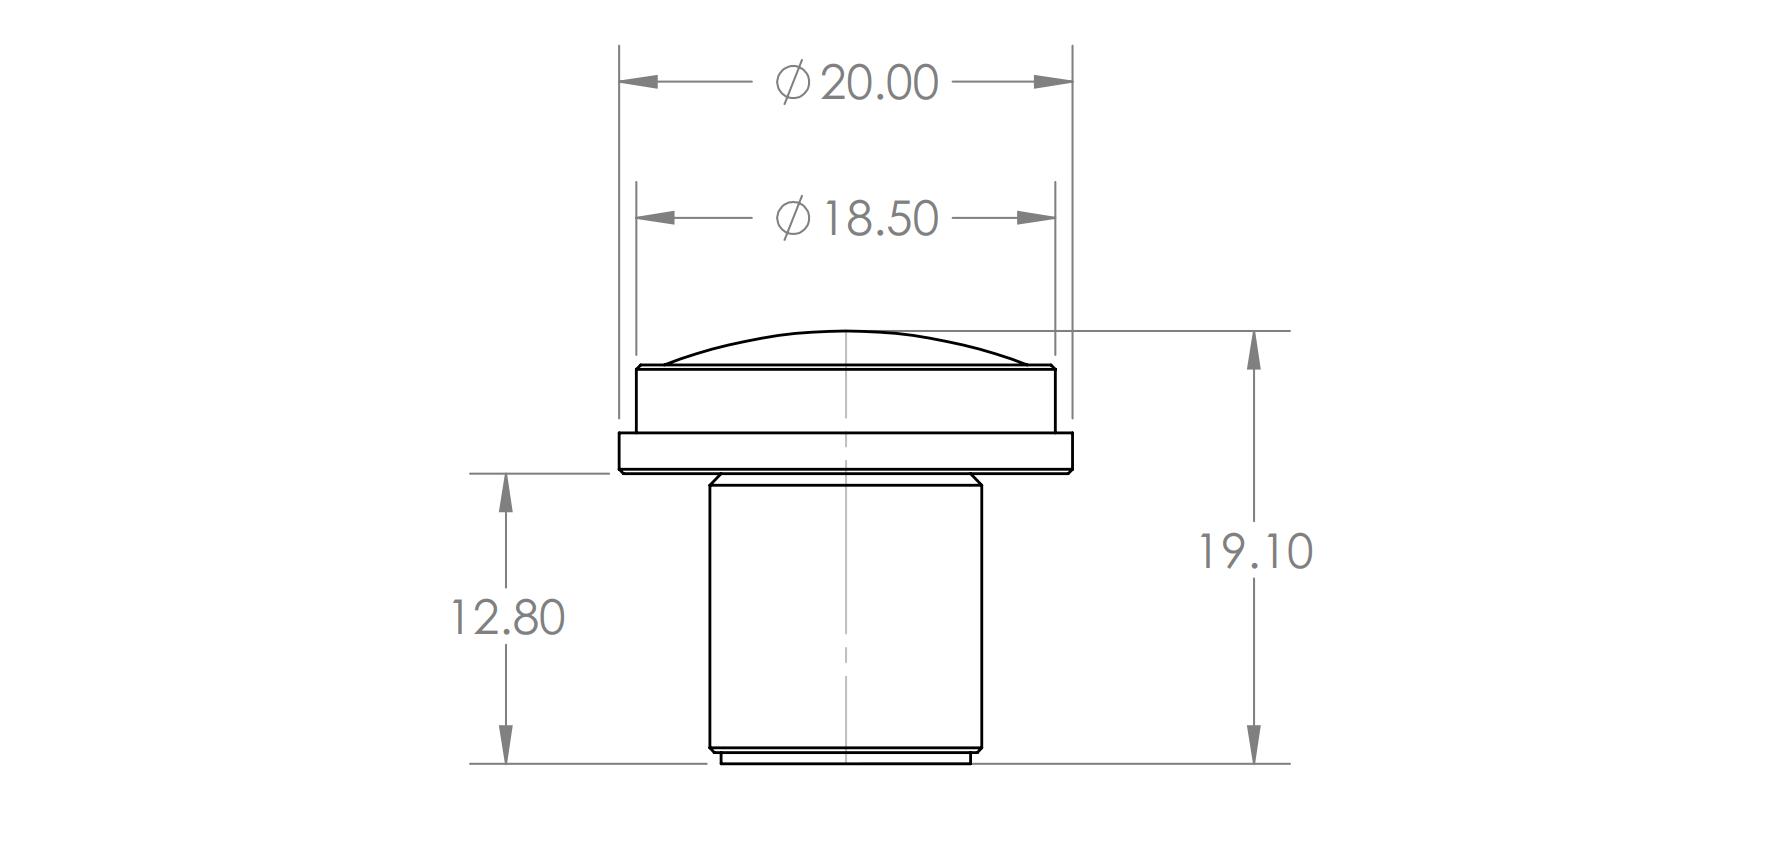 b3oL102-2_11-M12_dimensions.png